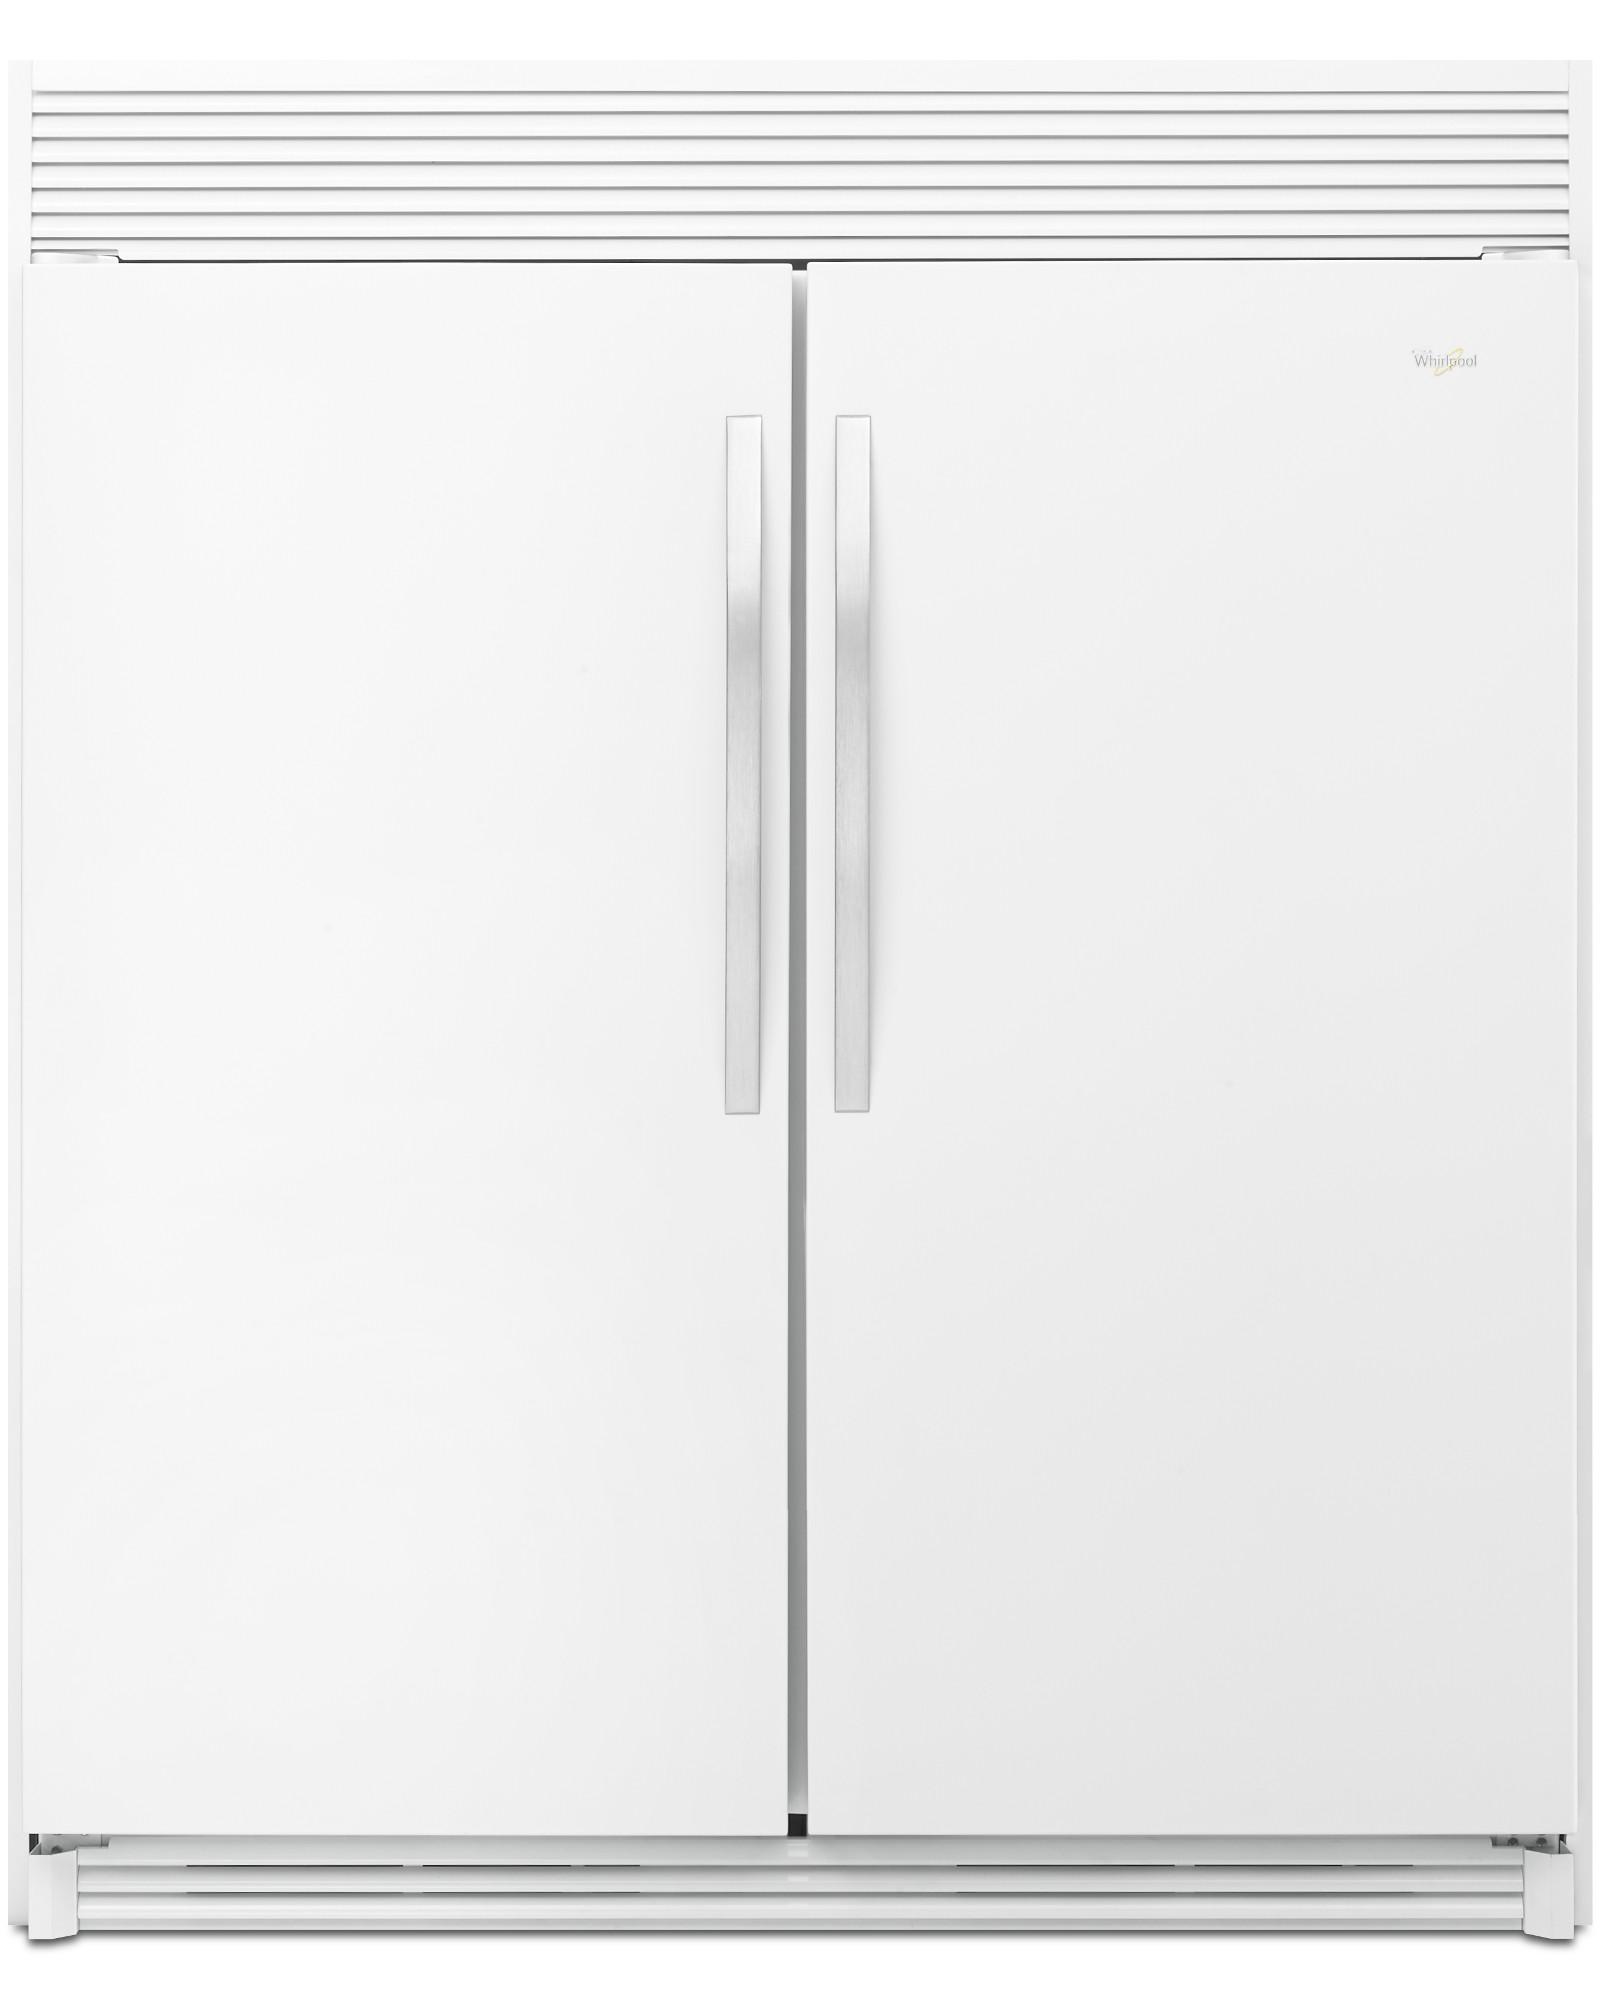 Whirlpool WSR57R18DH 18 cu. ft. SideKicks® Freezerless Refrigerator - - White